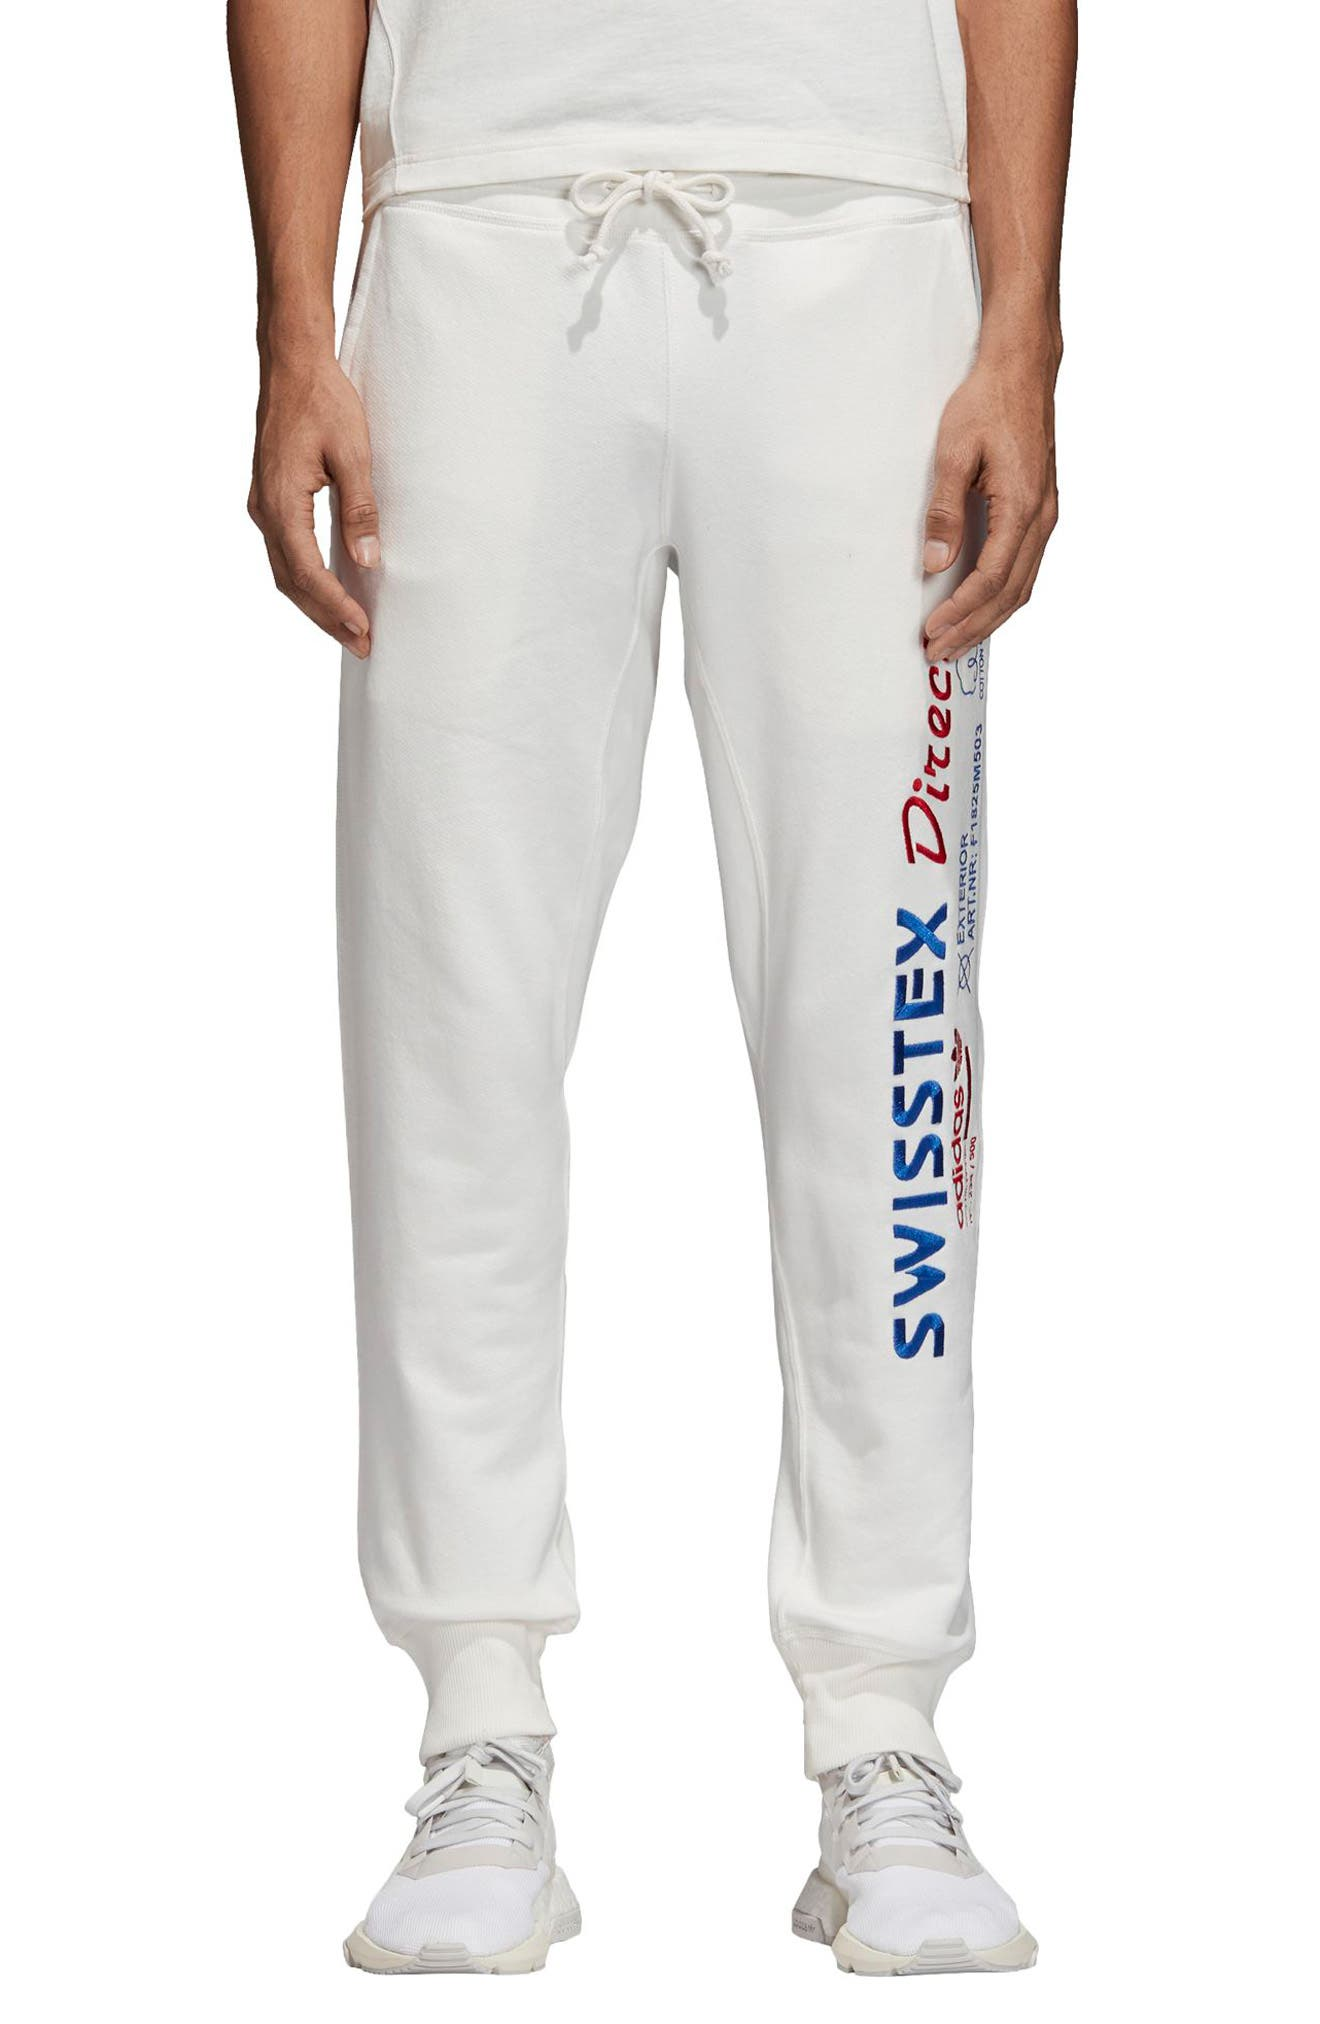 ADIDAS ORIGINALS Kaval Sweatpants, Main, color, 100